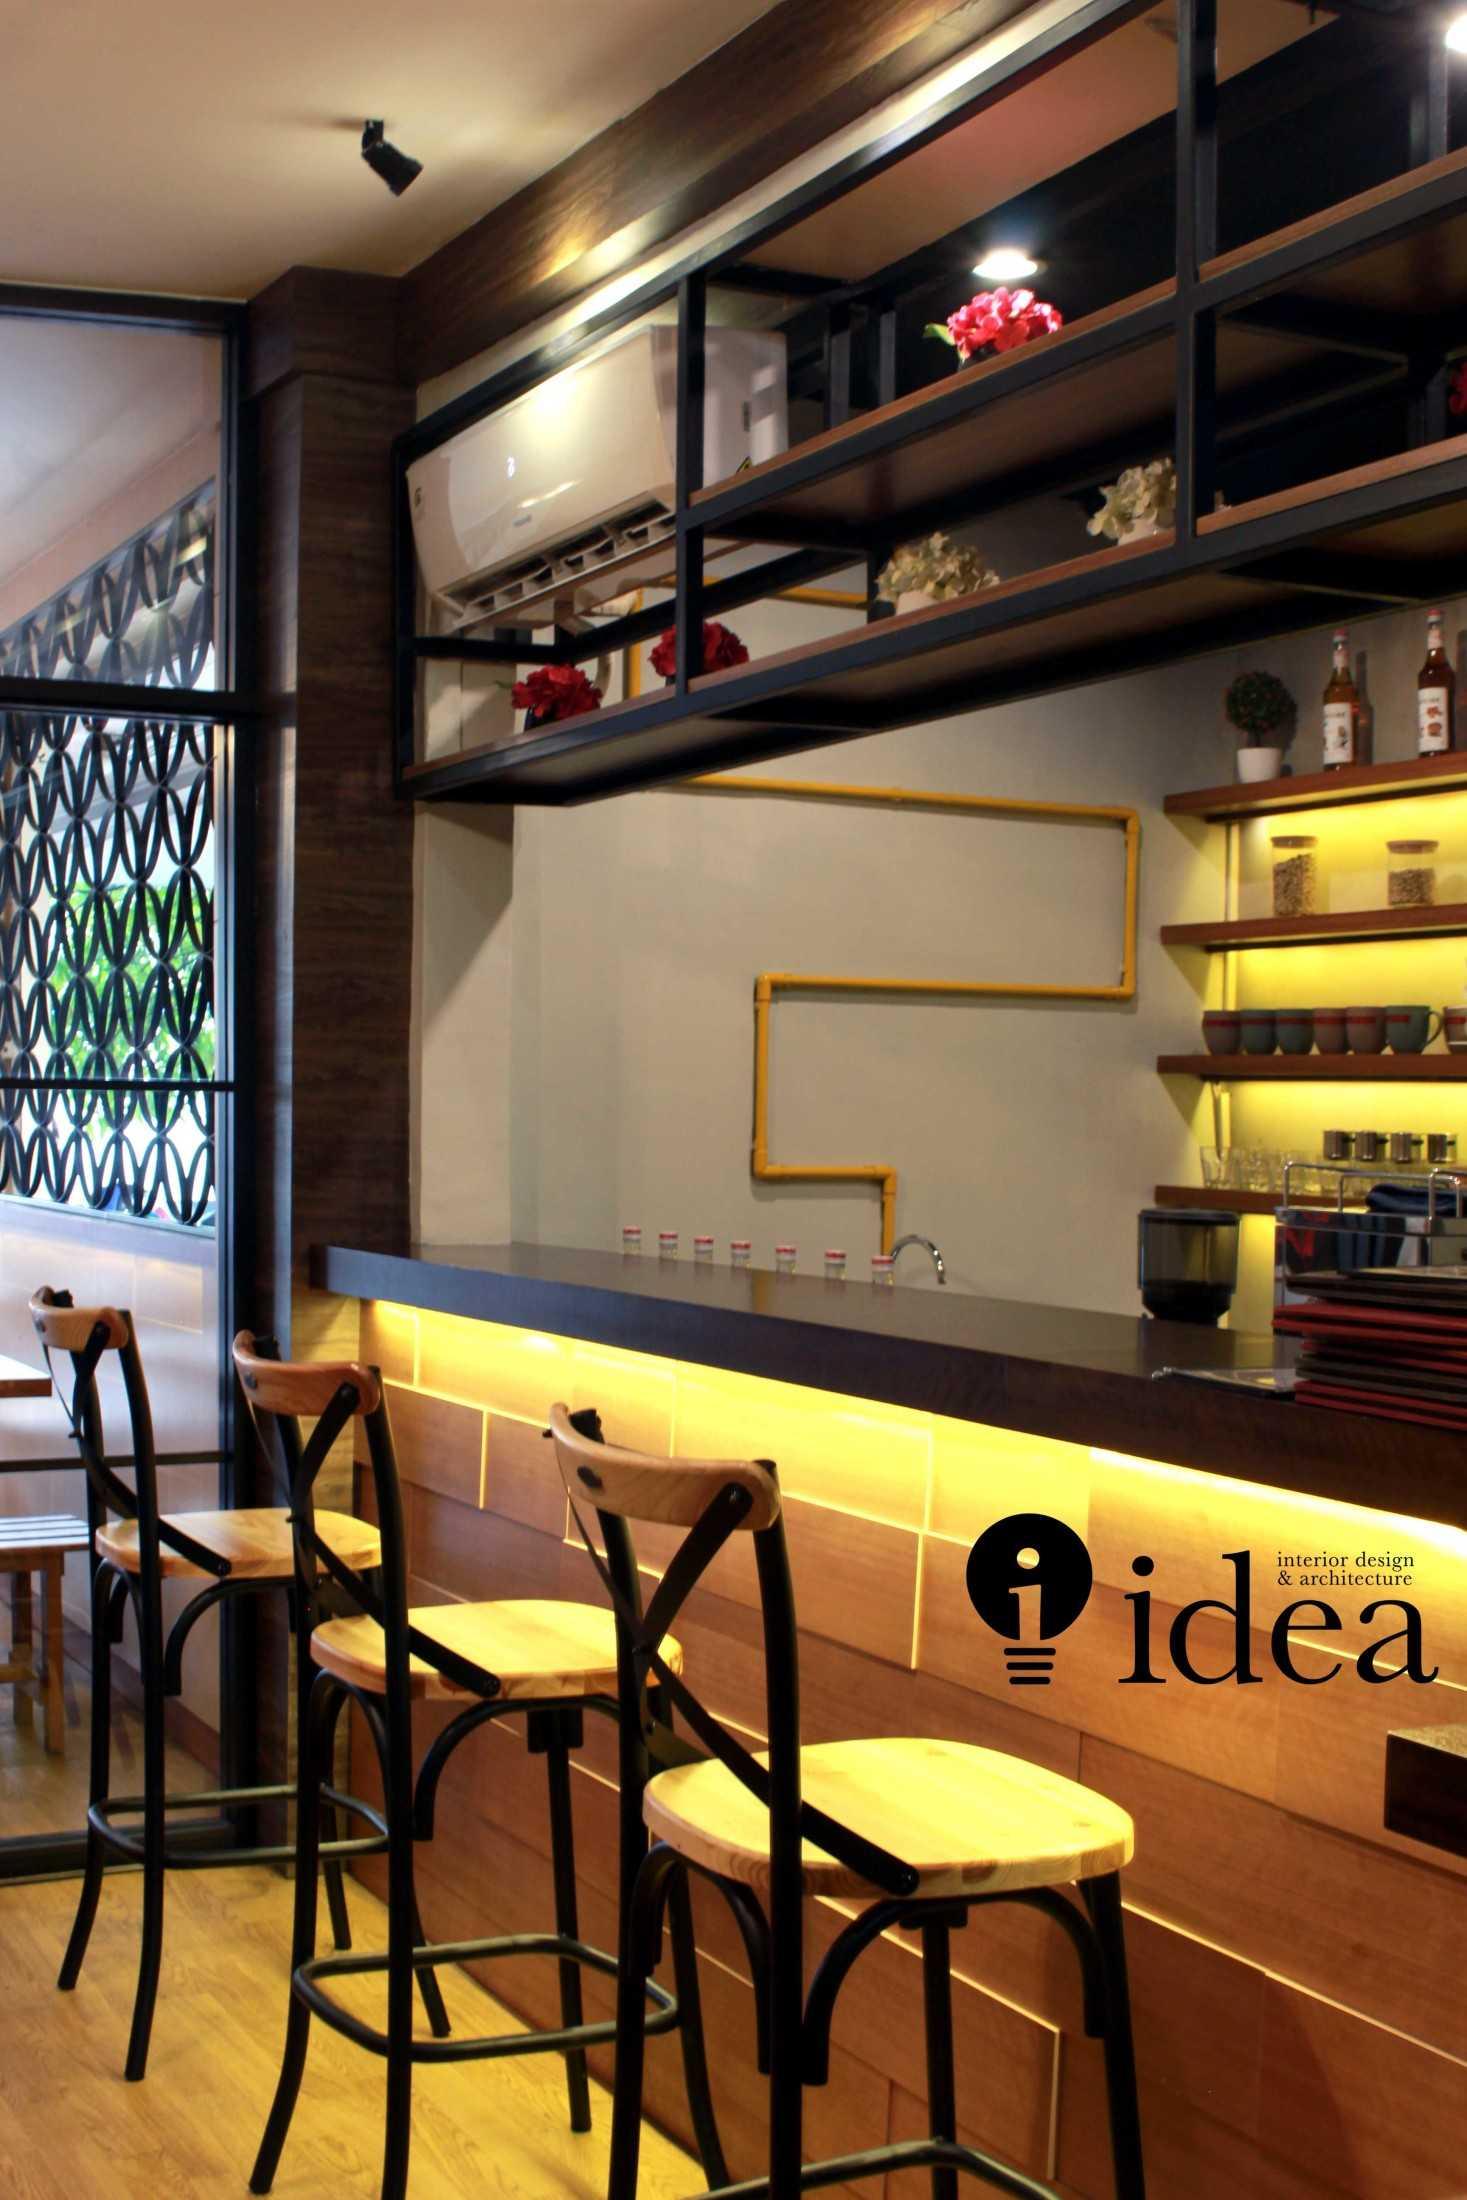 Idea Studio Coffee Bar - Nyonya Attha Surabaya, Kota Sby, Jawa Timur, Indonesia Surabaya, Kota Sby, Jawa Timur, Indonesia Idea-Studio-Coffee-Bar-Nyonya-Attha Industrial 79891